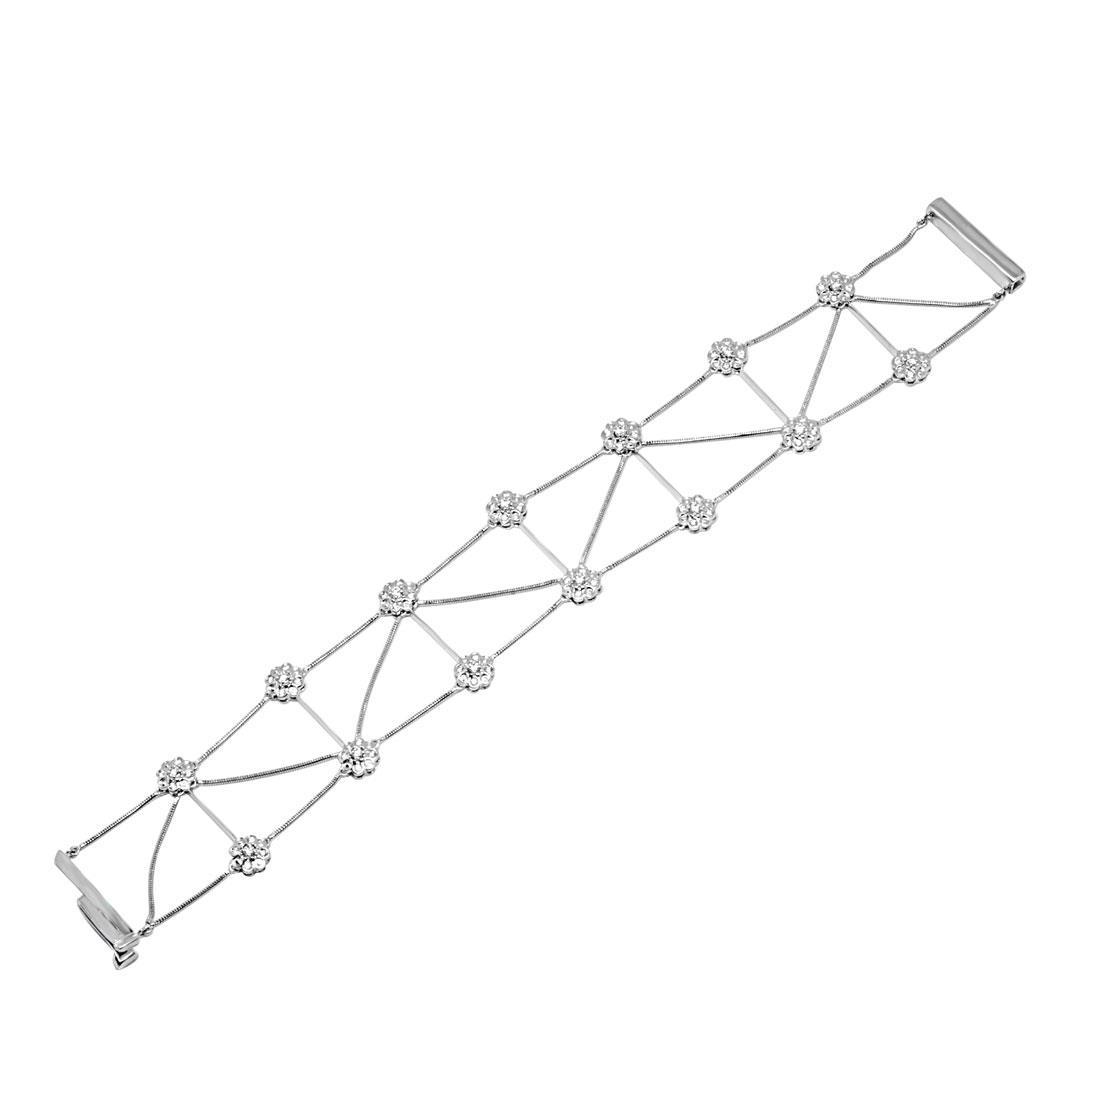 Bracciale Damiani in oro bianco con diamanti ct 0,69  - DAMIANI